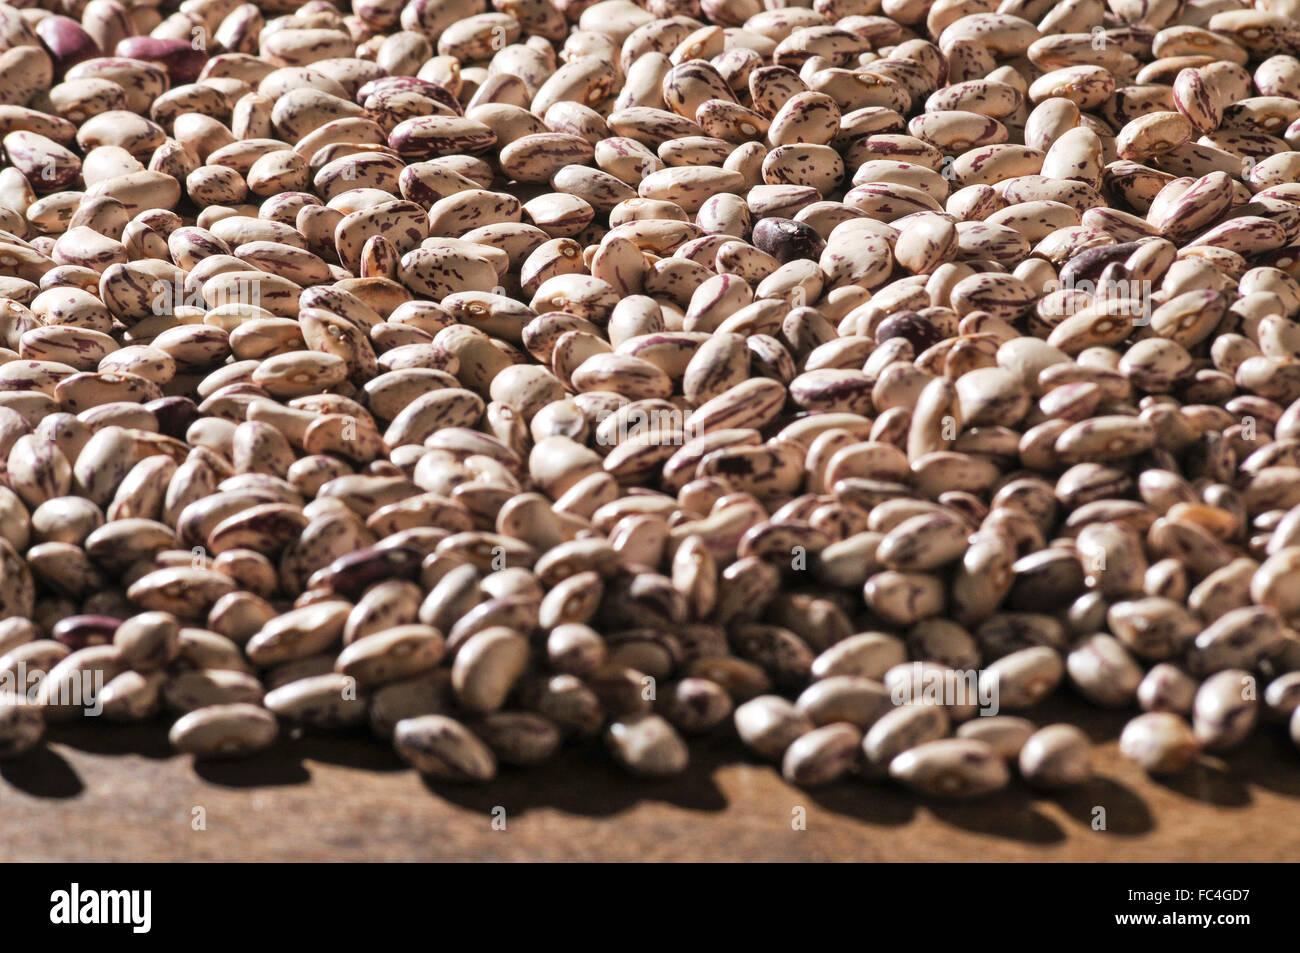 Detail of bean-Brindle - Stock Image